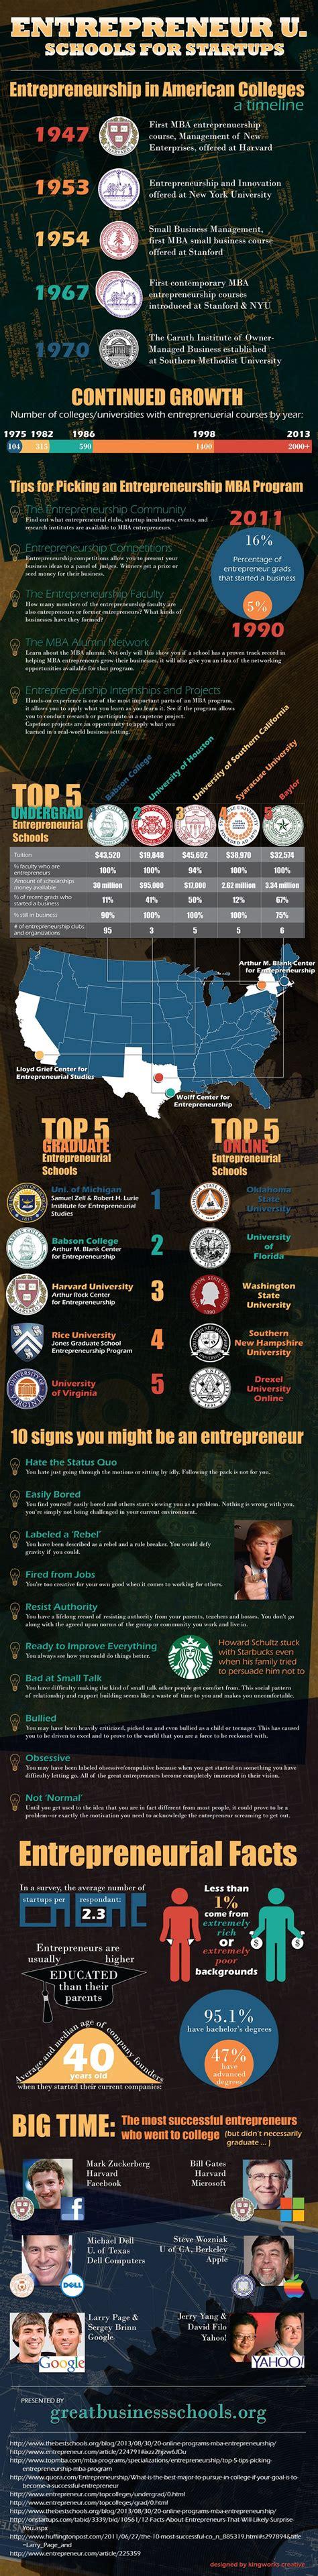 Top Mba Colleges For Entrepreneurship by Entrepreneur U Schools For Start Ups